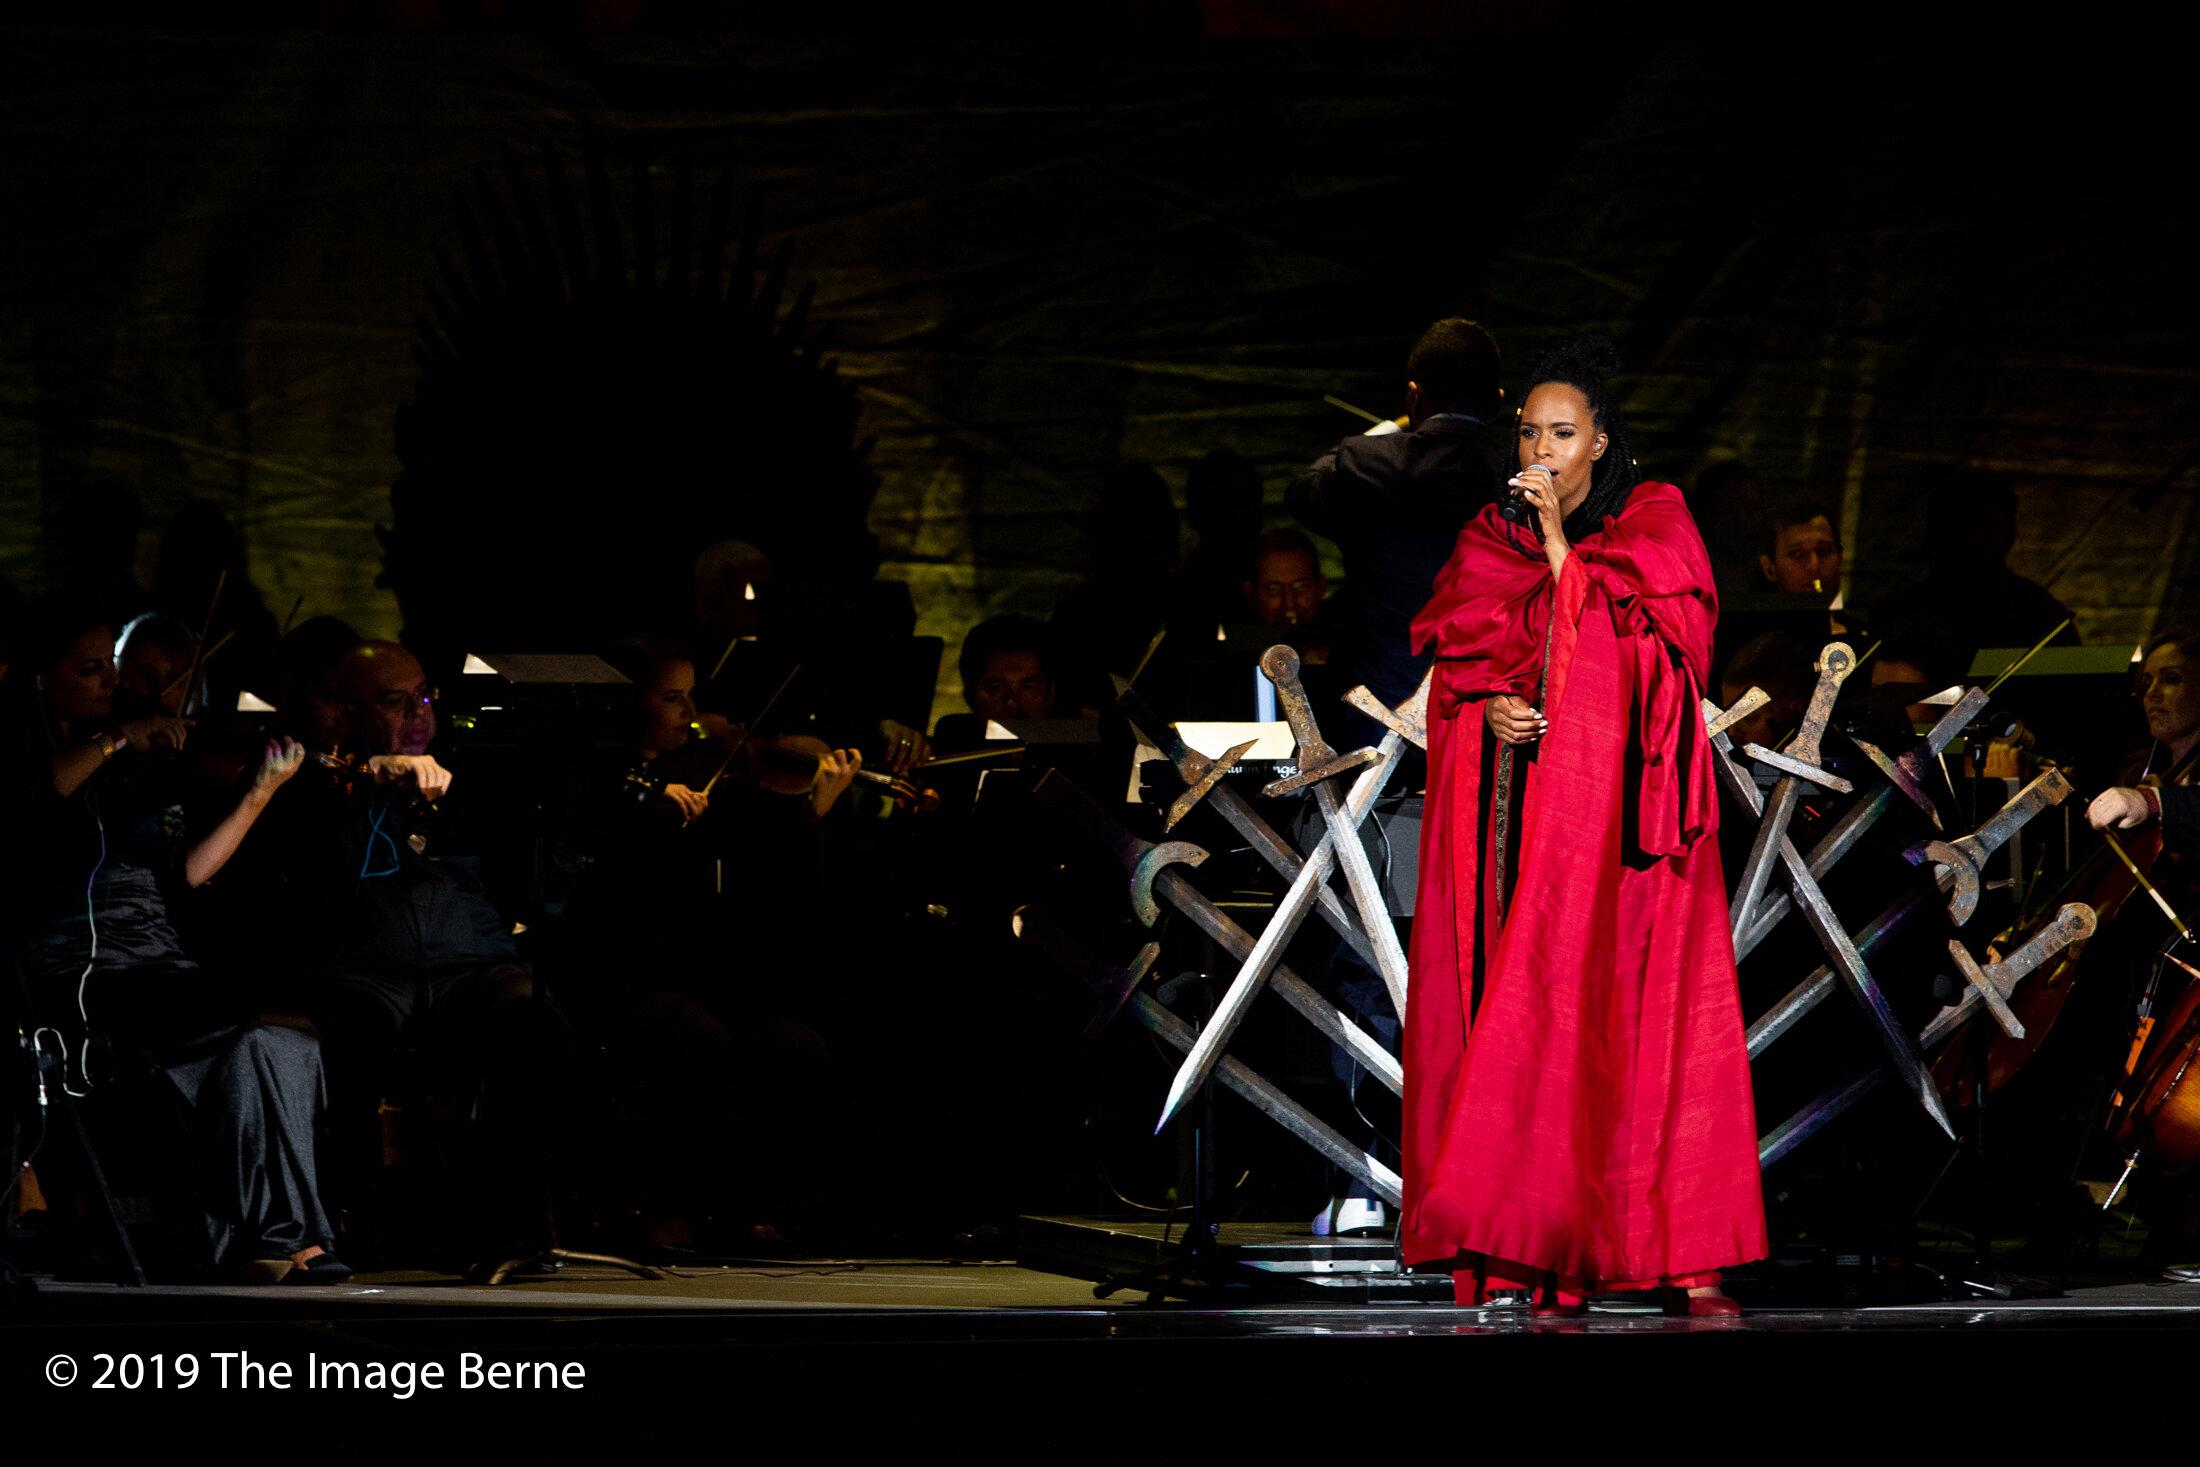 Game of Thrones Concert-41.jpg